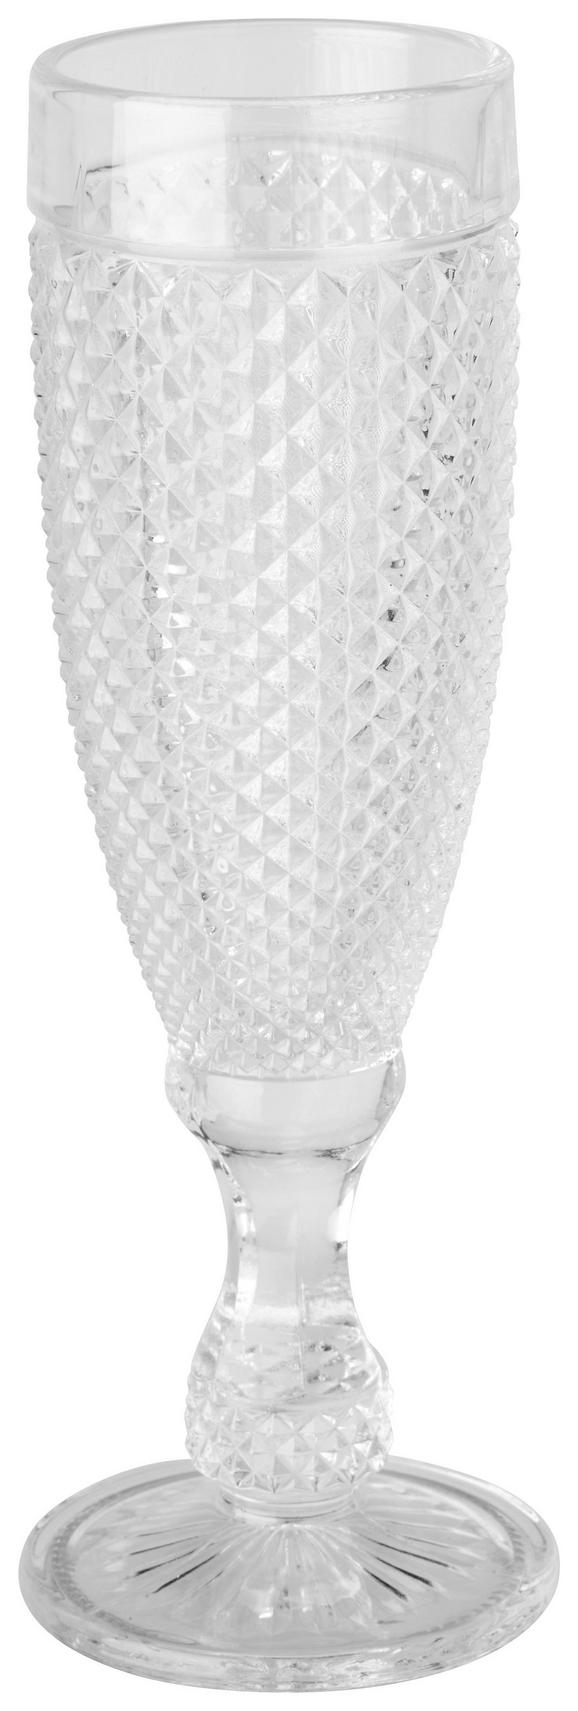 Champagnerglas Amelie 170ml - Transparent, ROMANTIK / LANDHAUS, Glas (6/20cm)